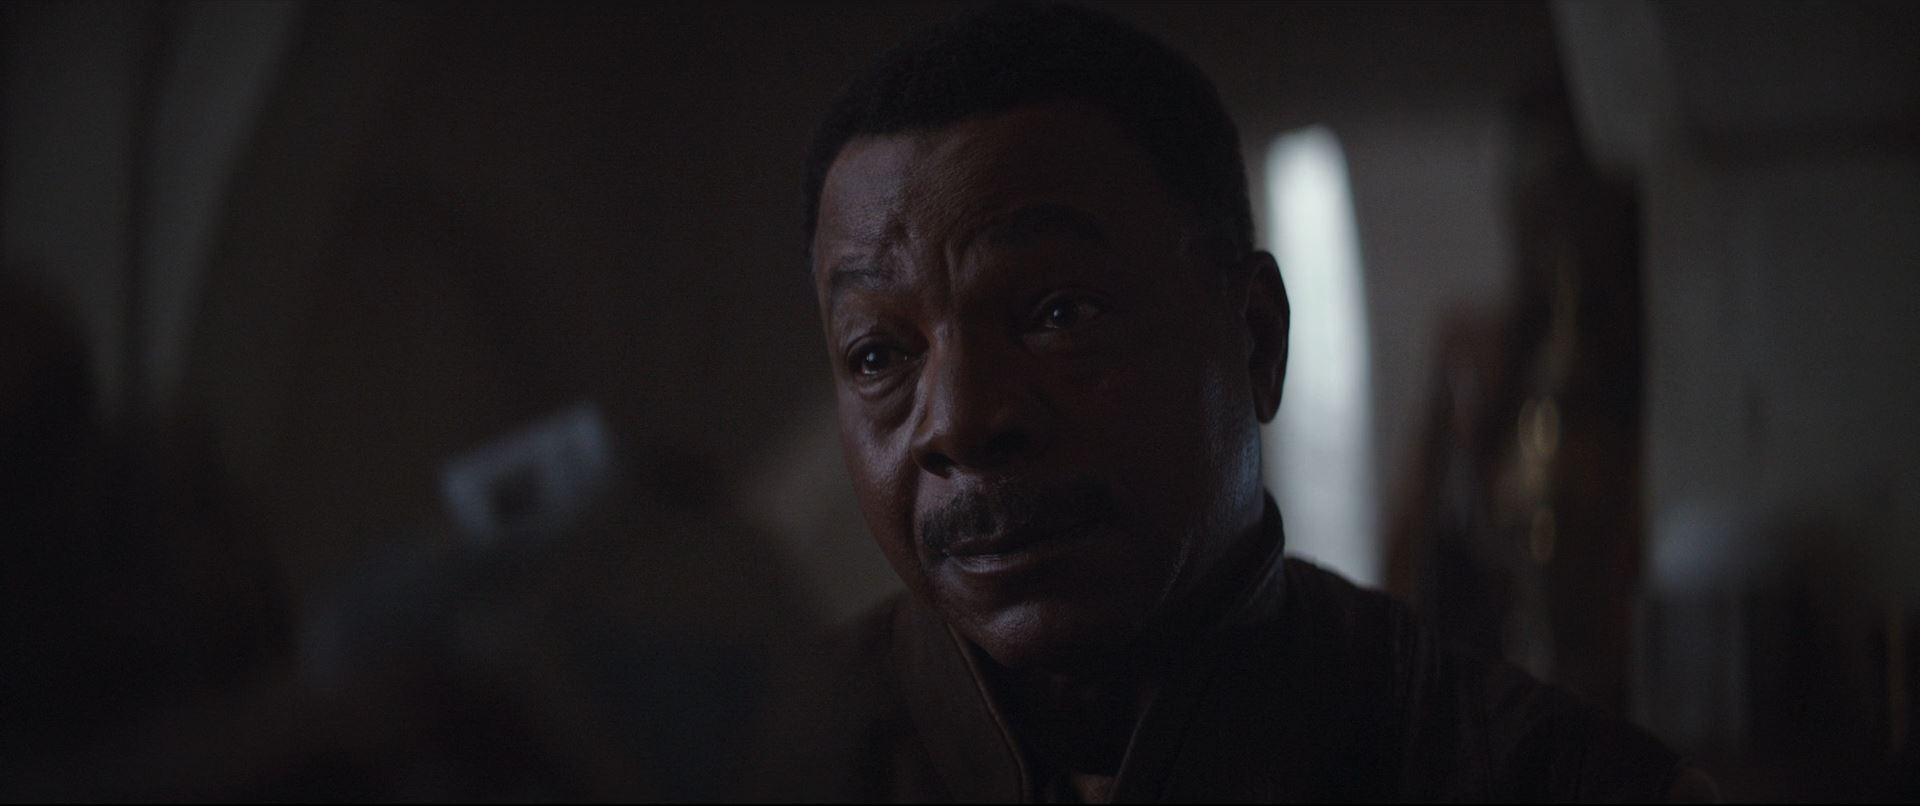 The Mandalorian - Carl Weathers as Greef Carga